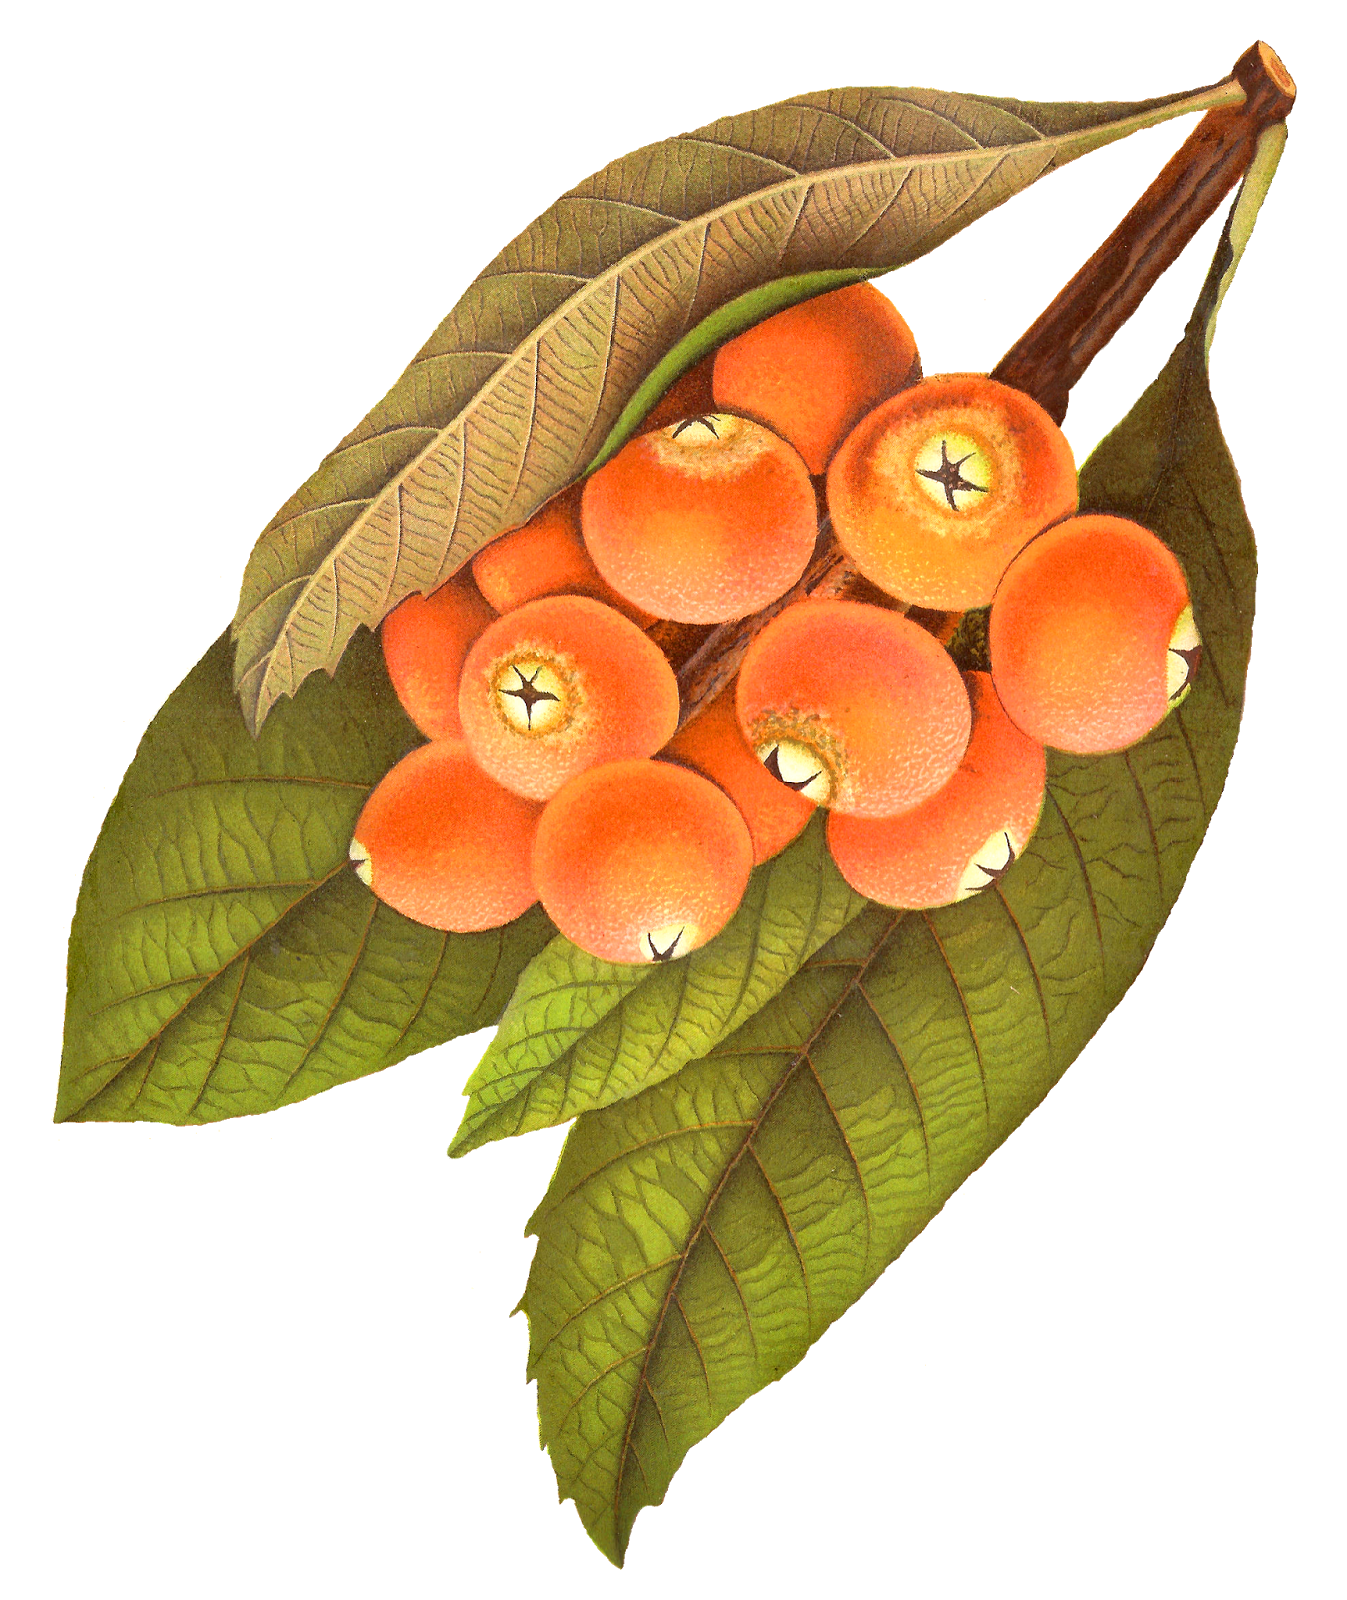 Rowan tree clipart transparent download Antique Images: Free Printable Fruit Image Rowan Berry Artwork ... transparent download